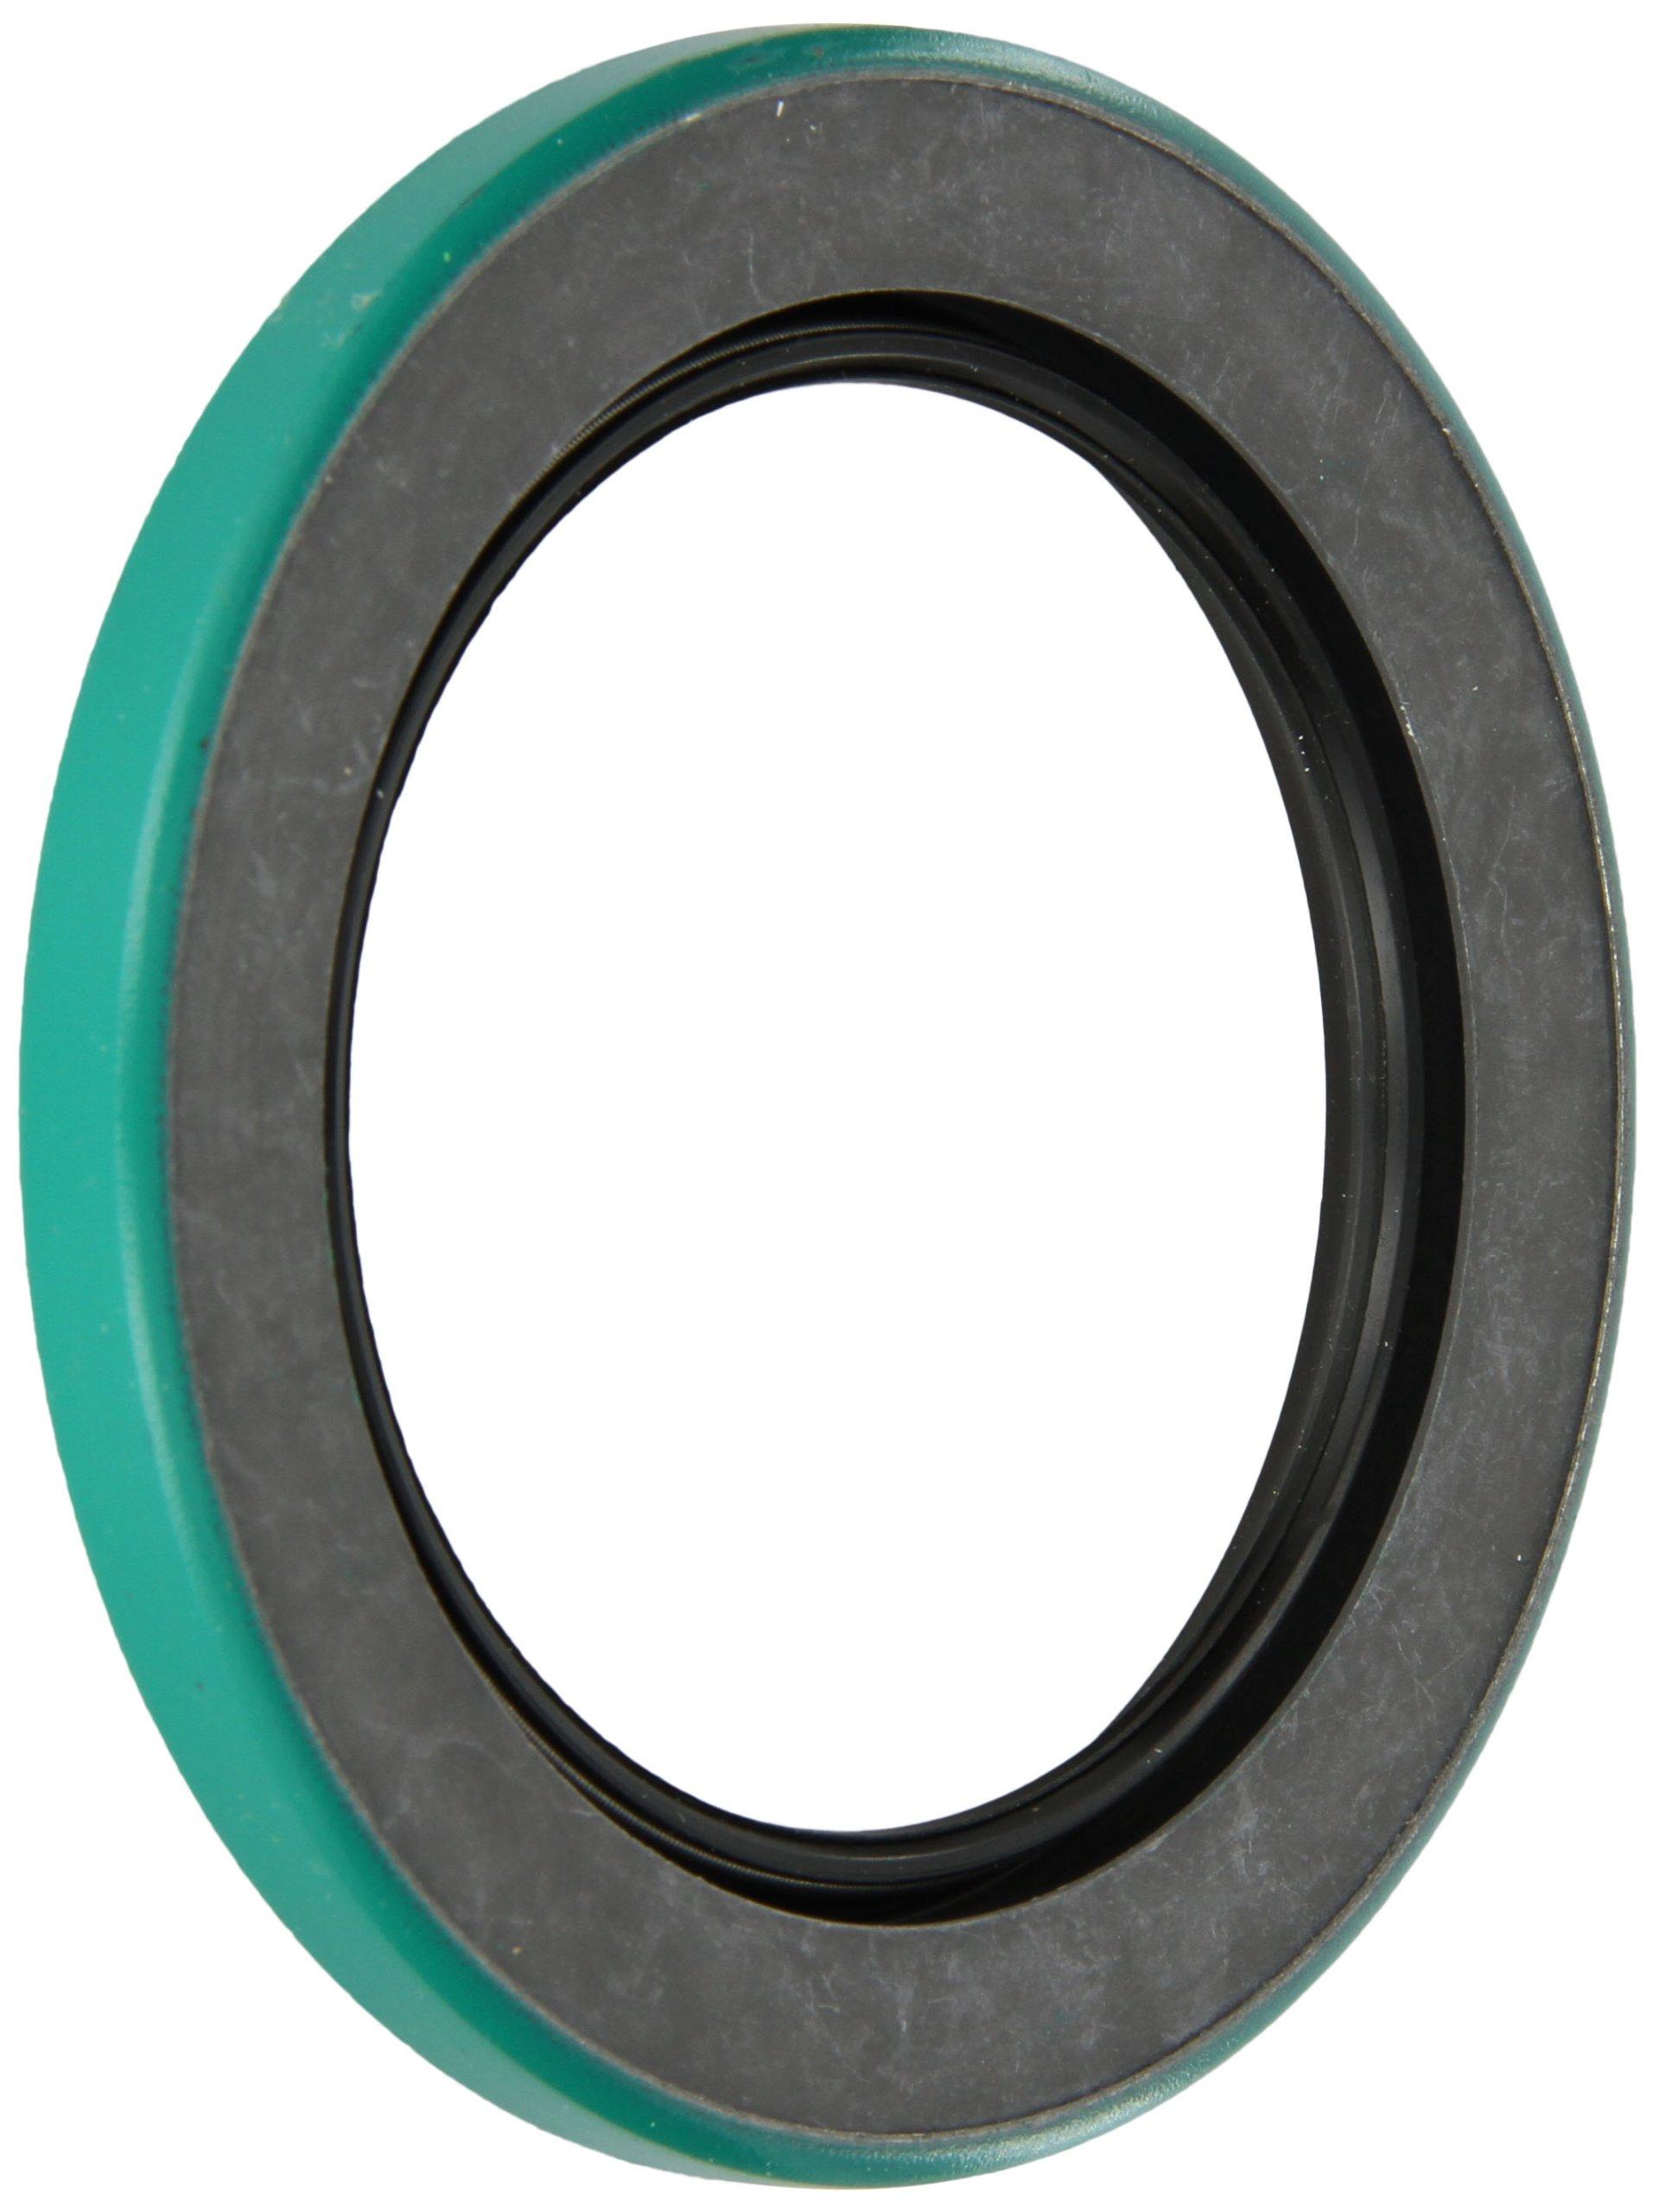 SKF 28817 LDS & Small Bore Seal, R Lip Code, CRWH1 Style, Inch, 2.875'' Shaft Diameter, 4.125'' Bore Diameter, 0.375'' Width